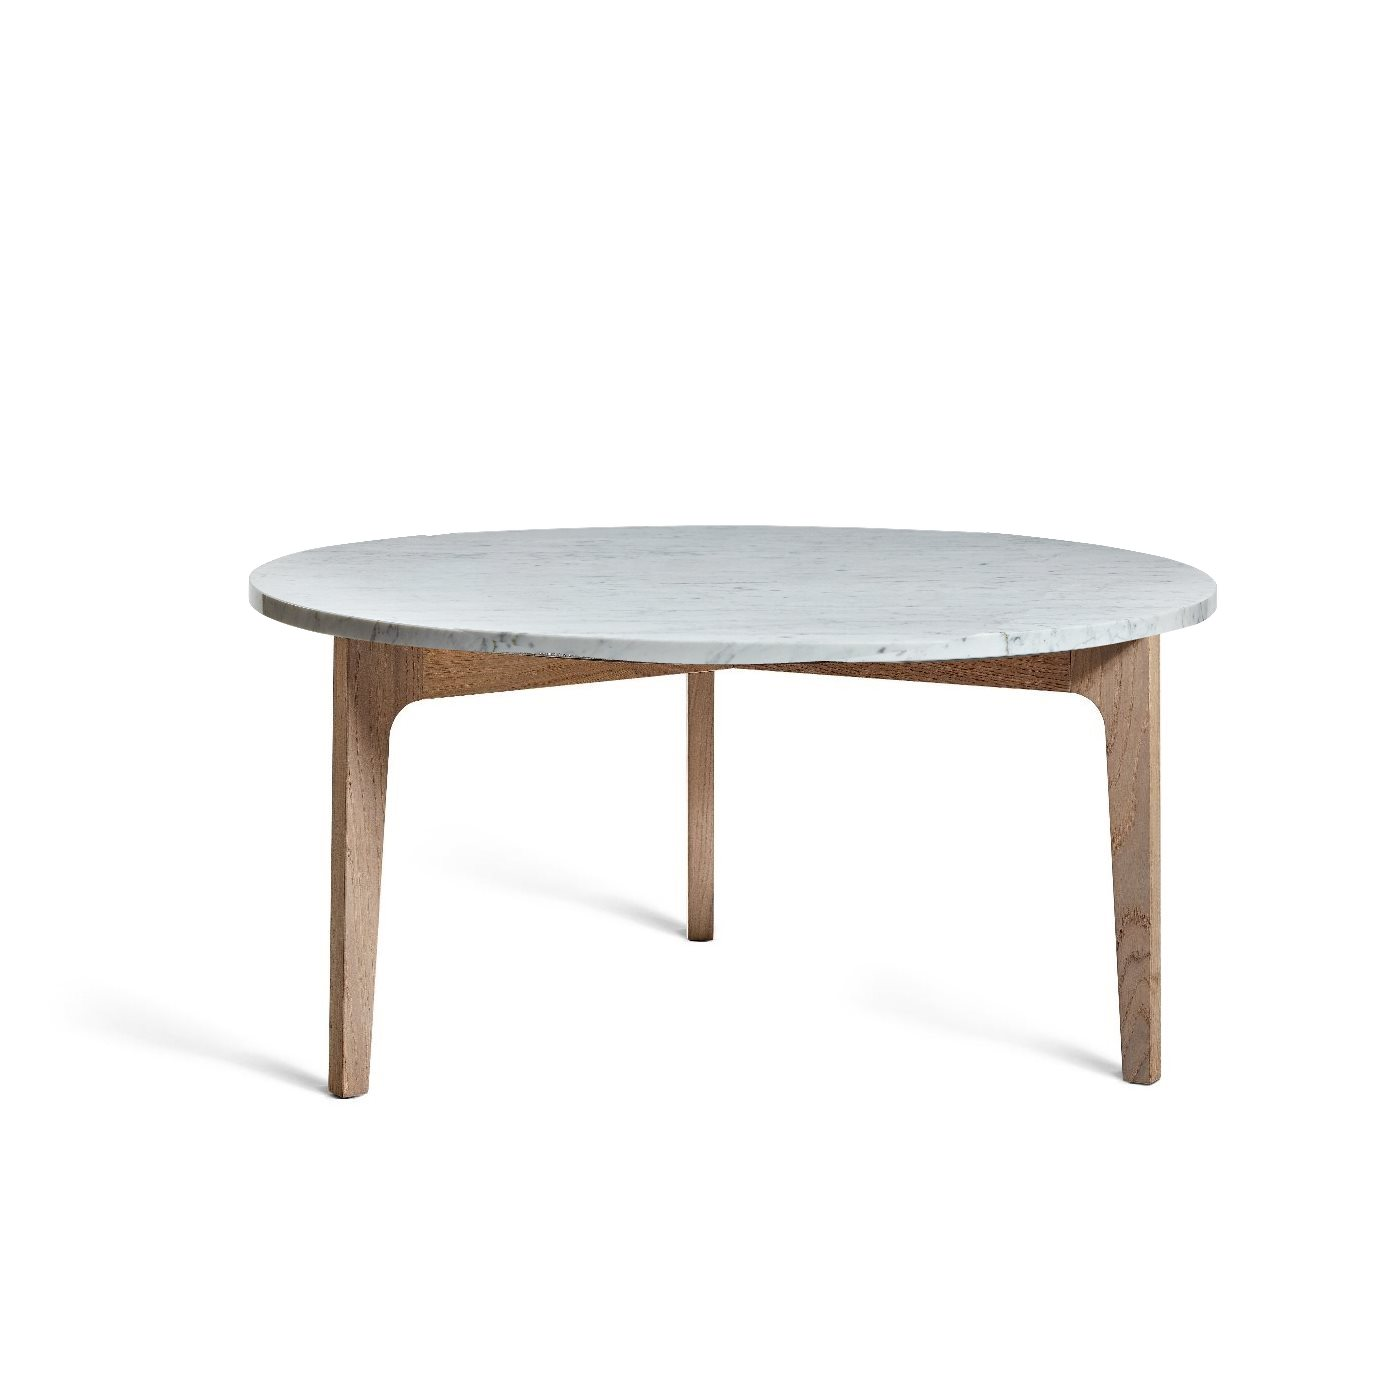 Höllviken soffbord ek / marmor, Mavis